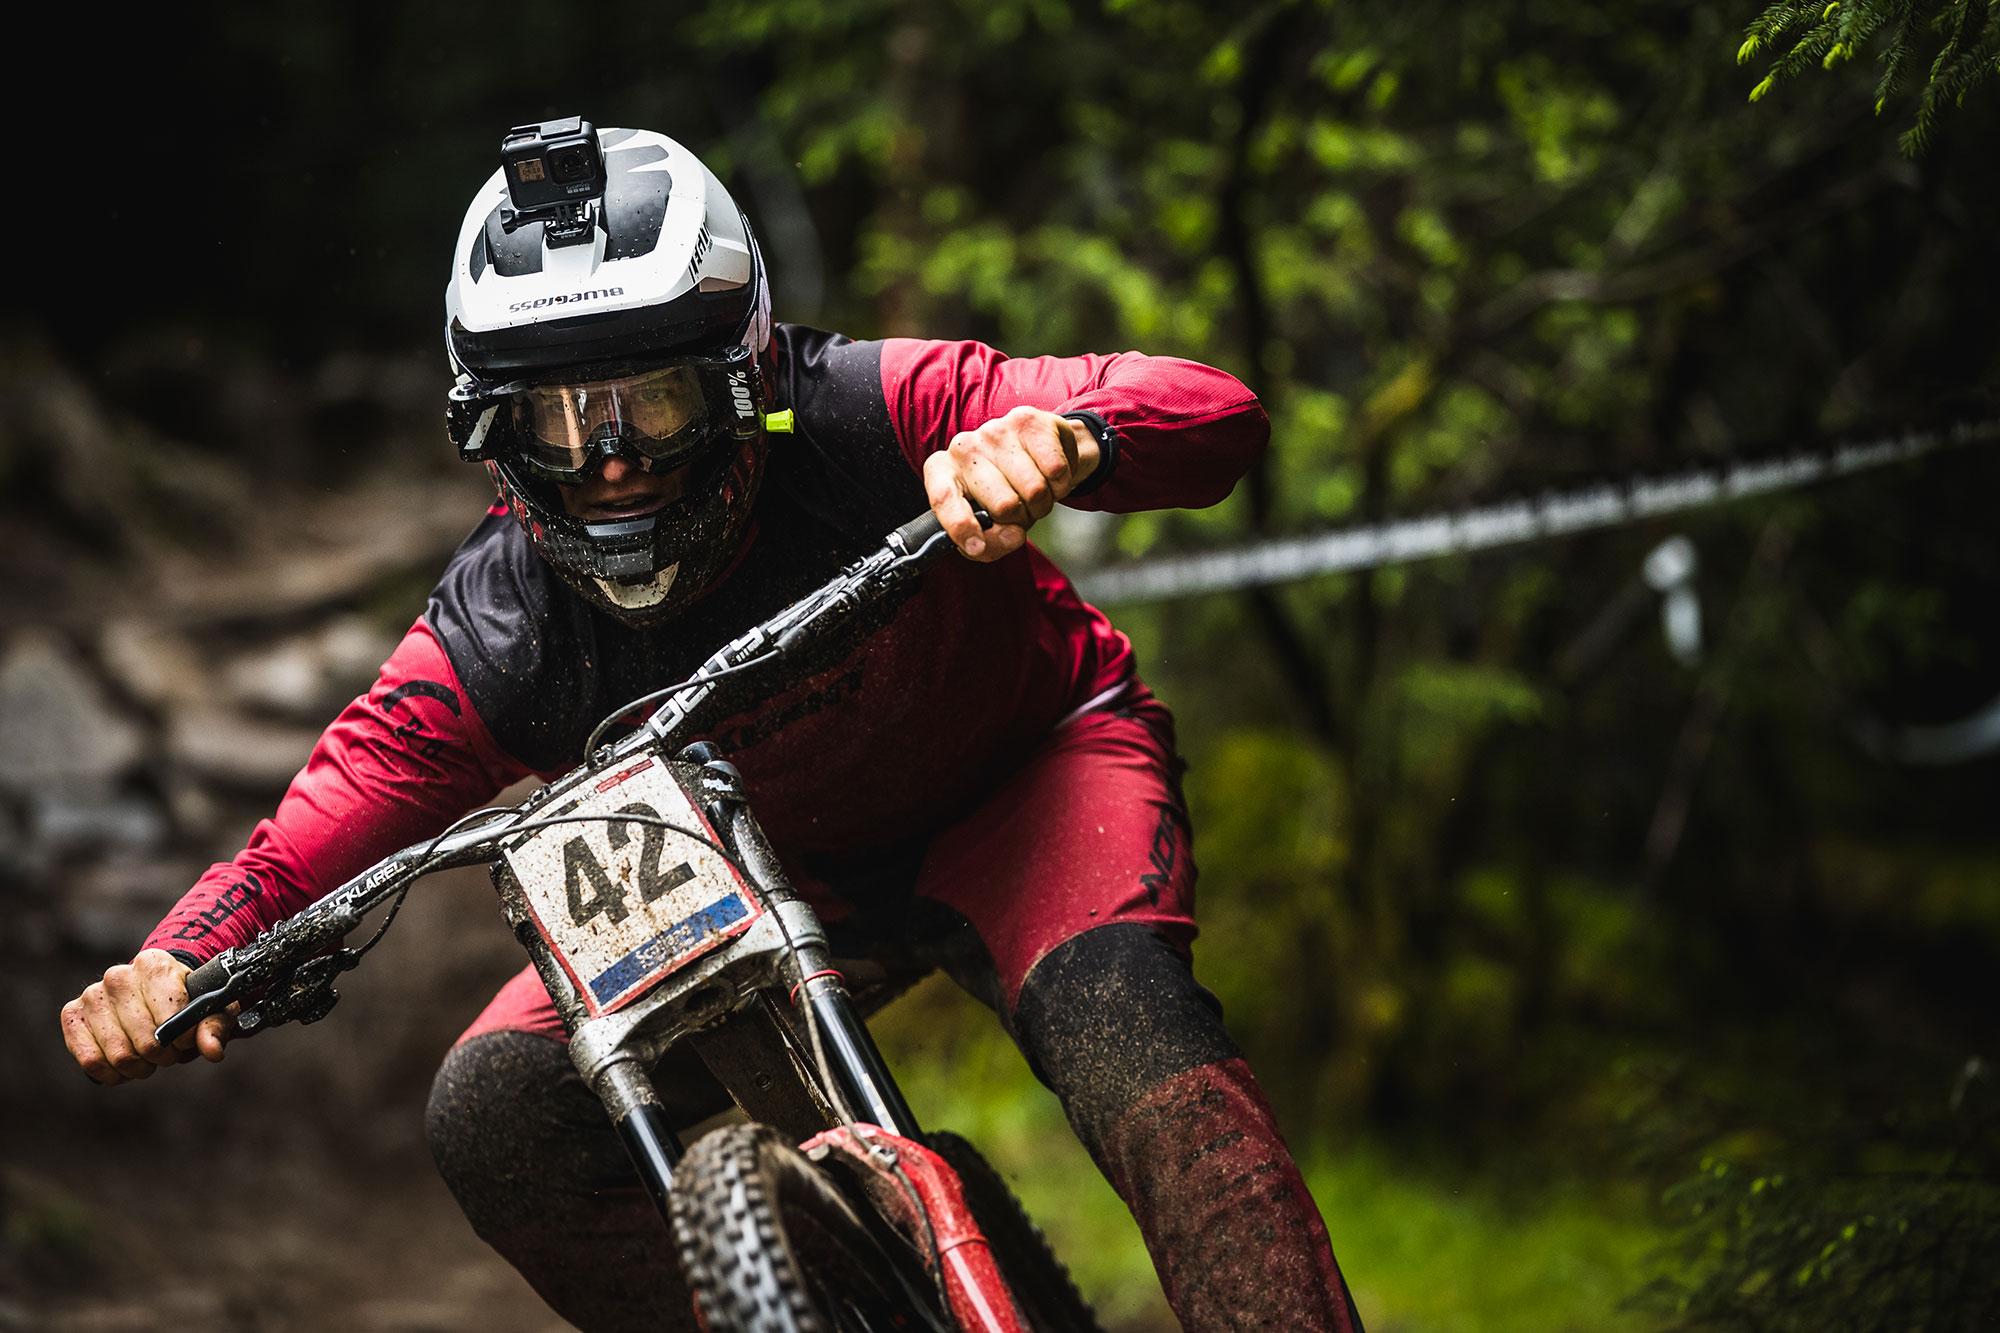 Sam Blenkinsop Fort William DH World Cup Bluegrass Legit carbon DH Helmet